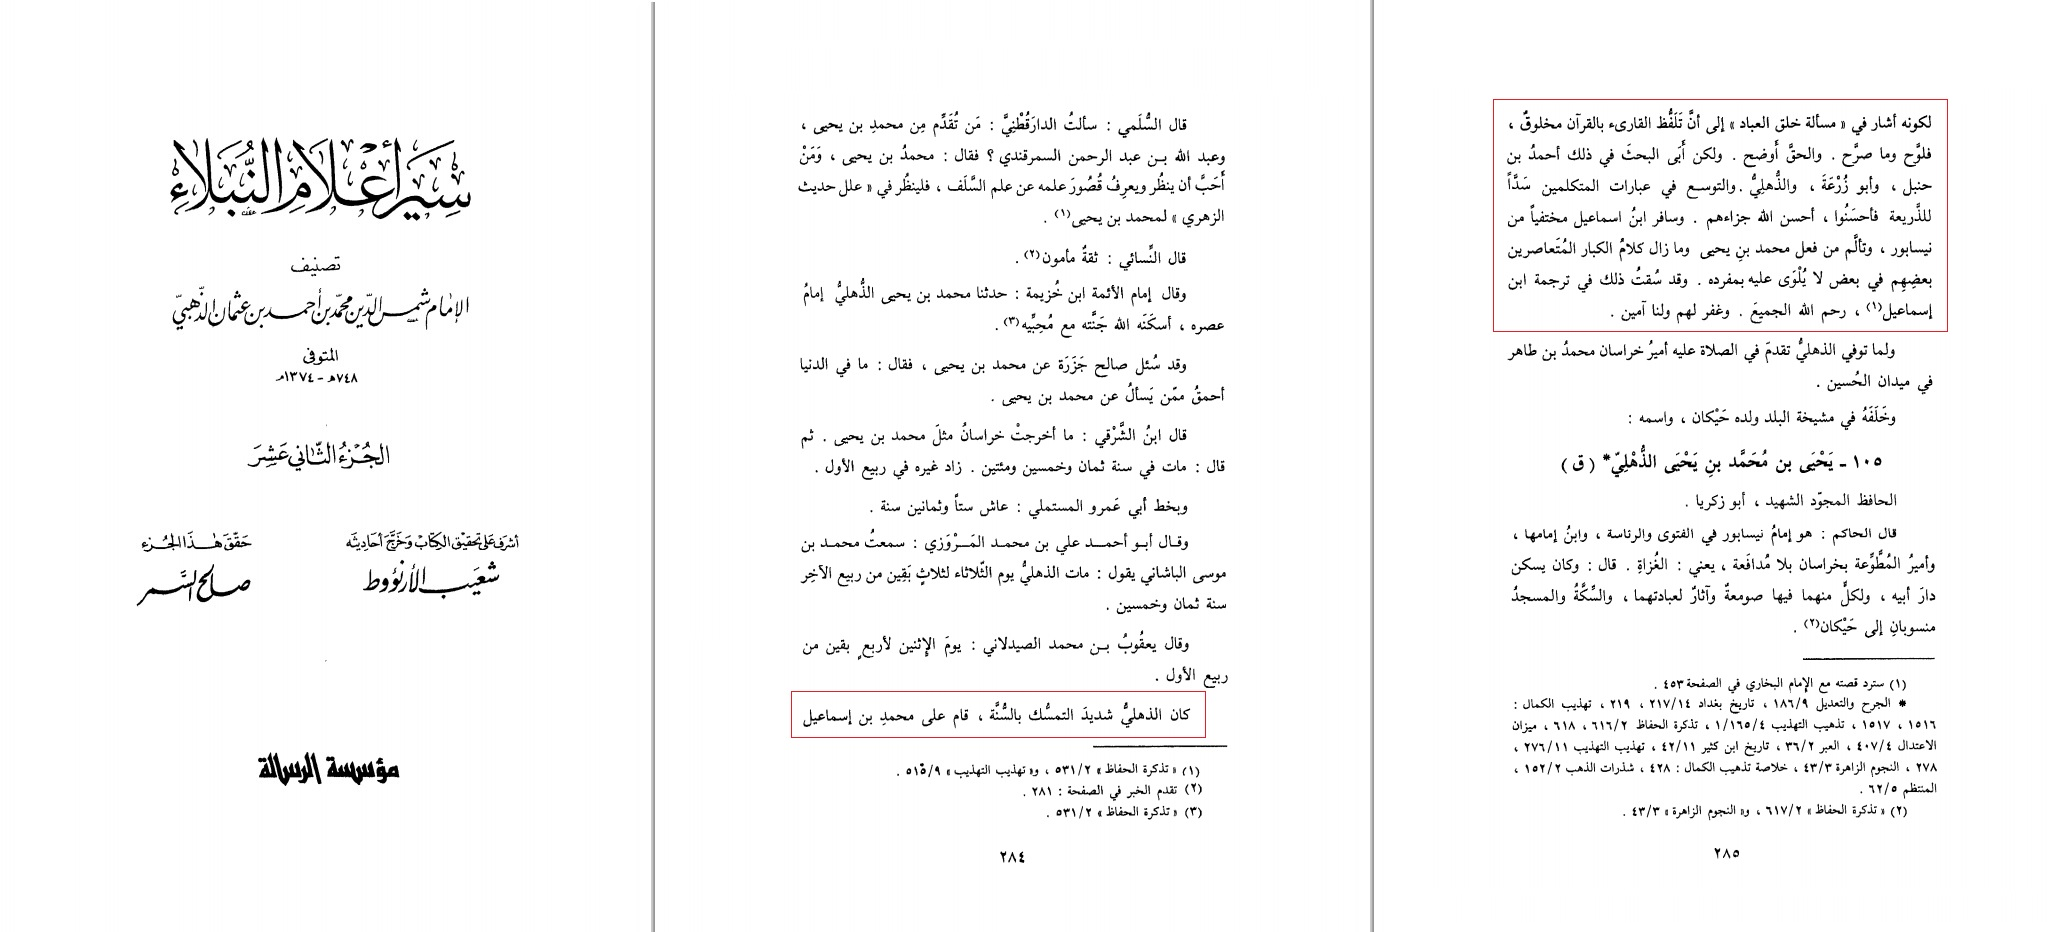 Seyar-e Dhahabi B 13 S284 - 285